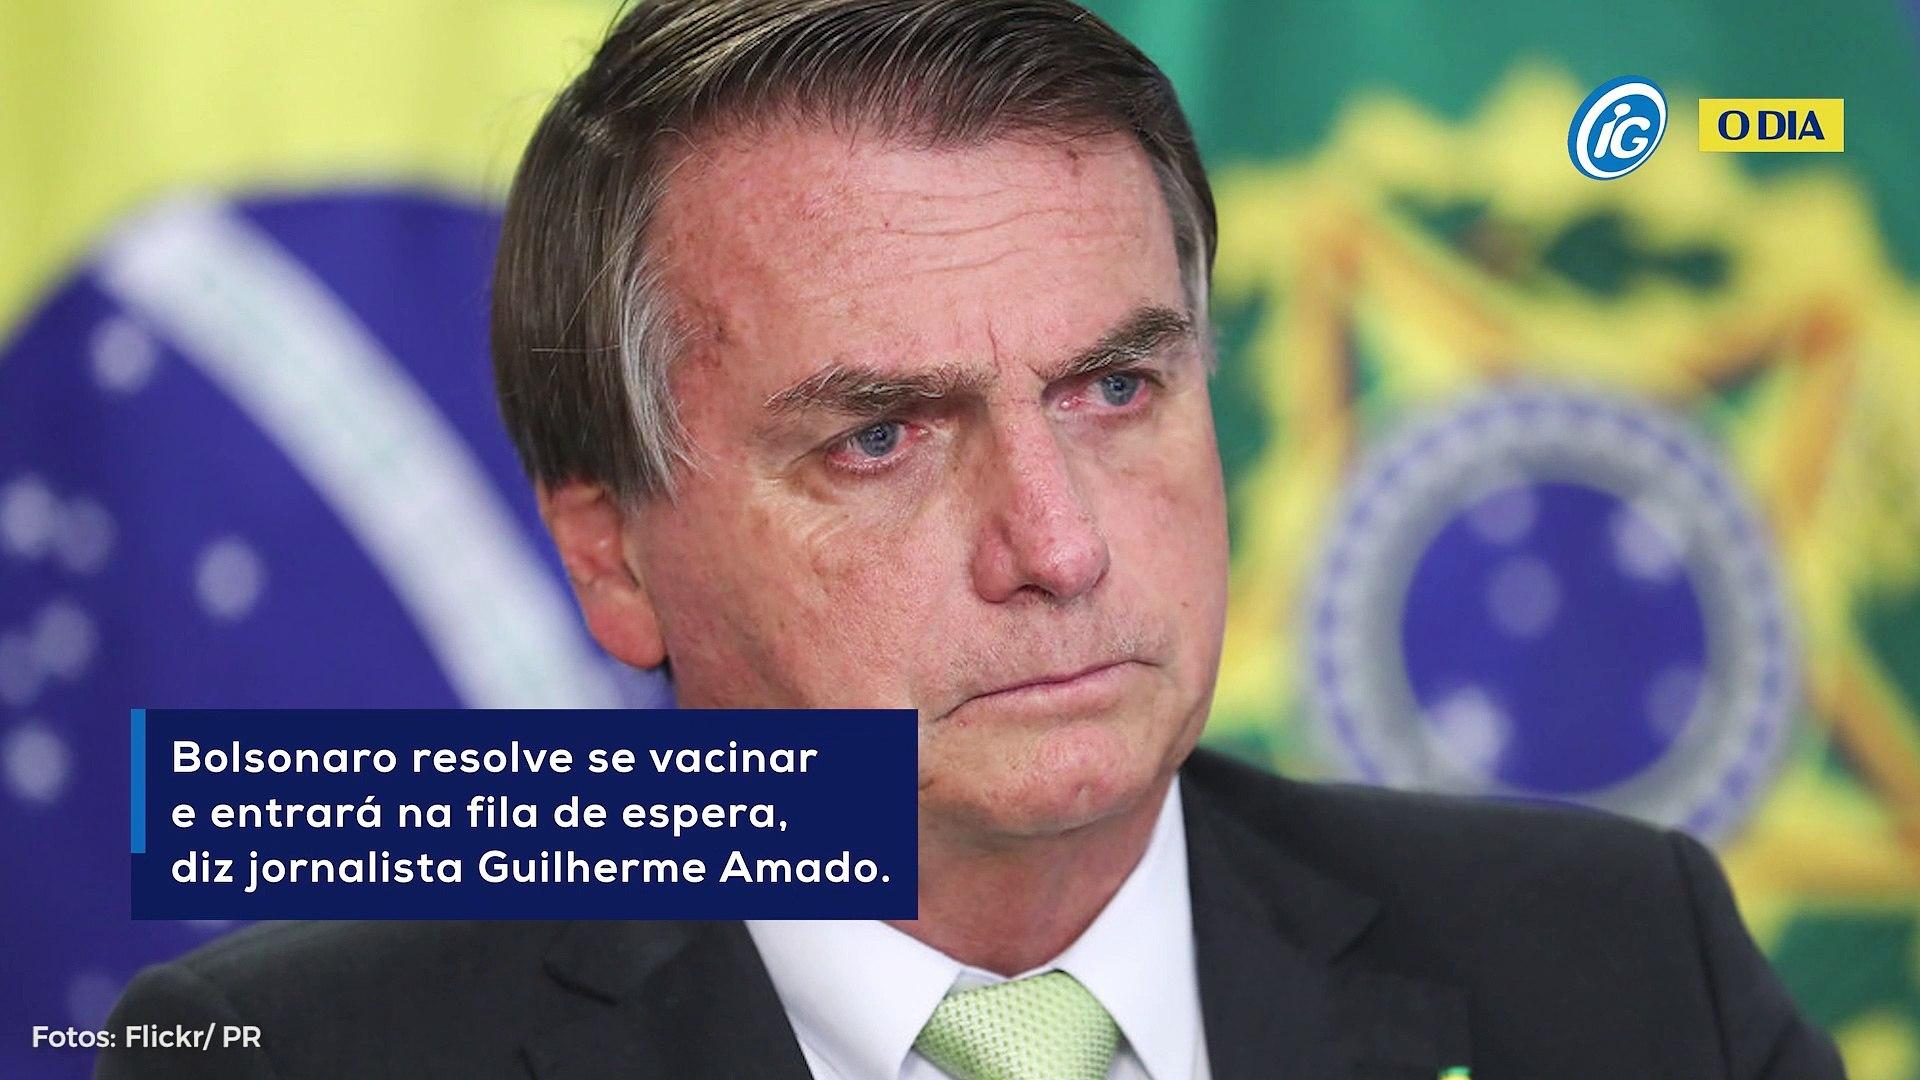 Bolsonaro resolve se vacinar e entrará na fila de espera, diz jornalista